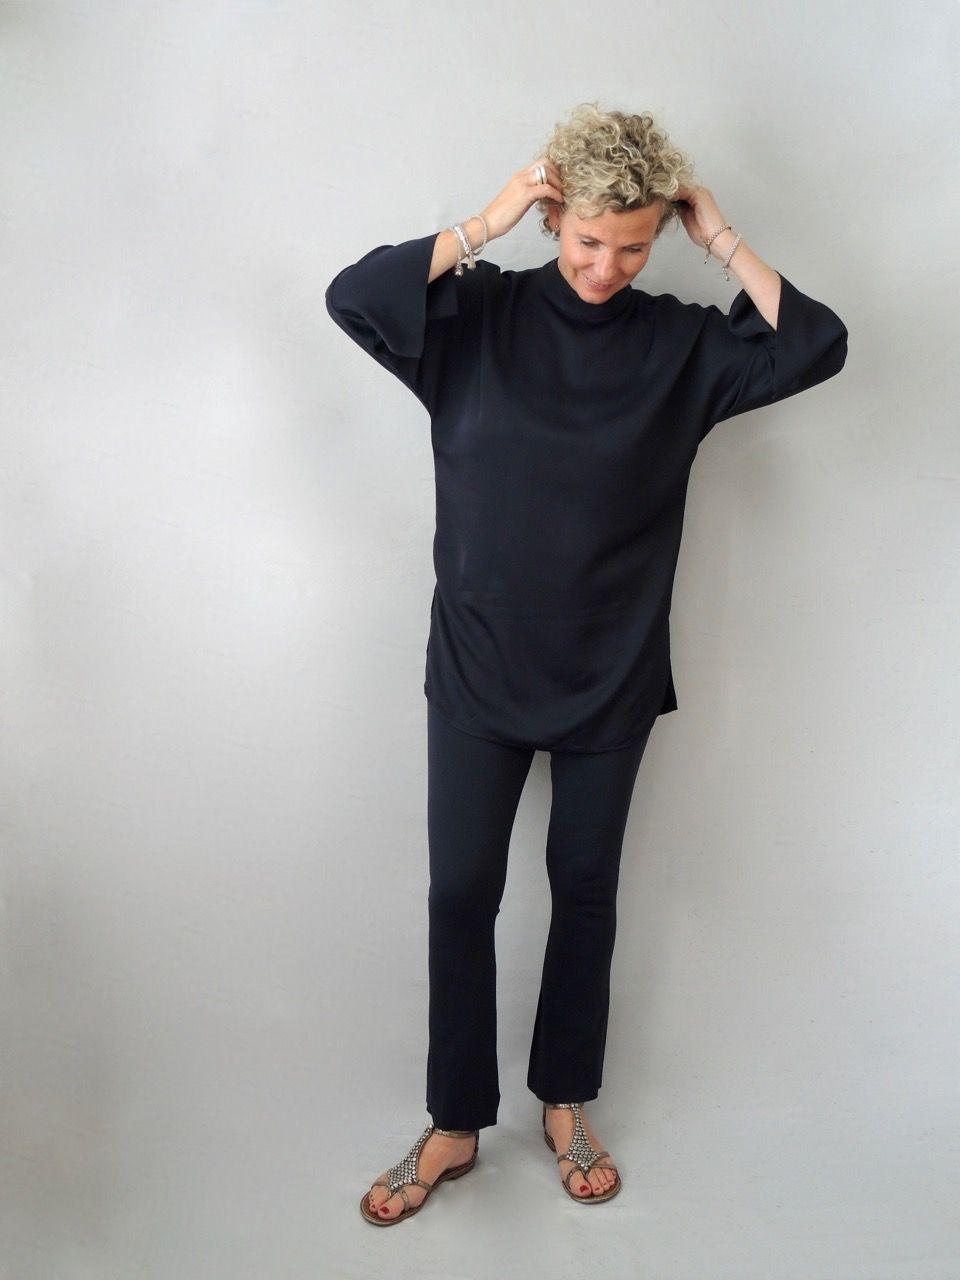 ganz bequem und trotzdem edel my style2 fashion. Black Bedroom Furniture Sets. Home Design Ideas